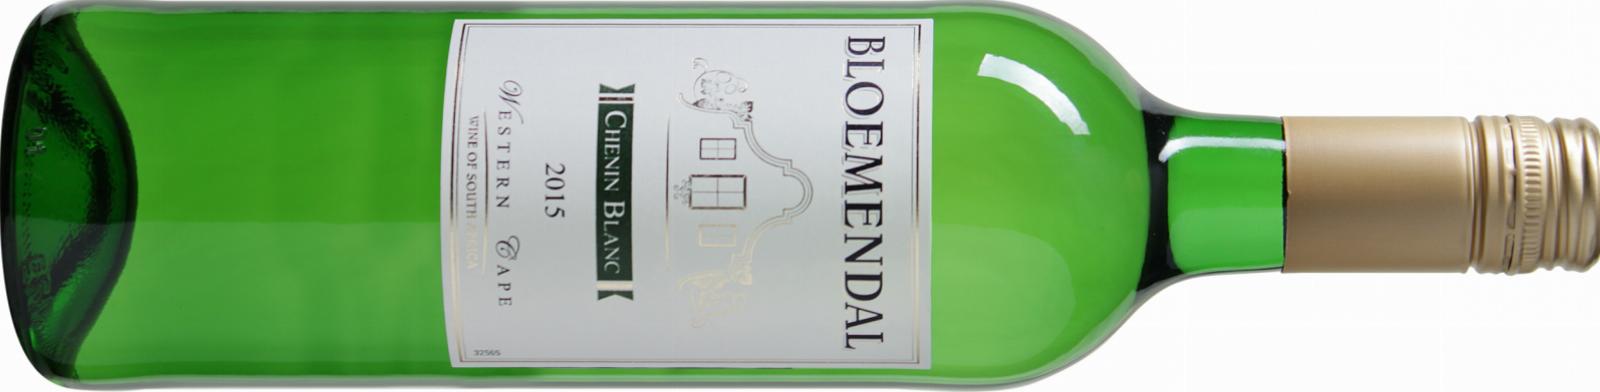 Bloemendal Chenin Blanc 2015